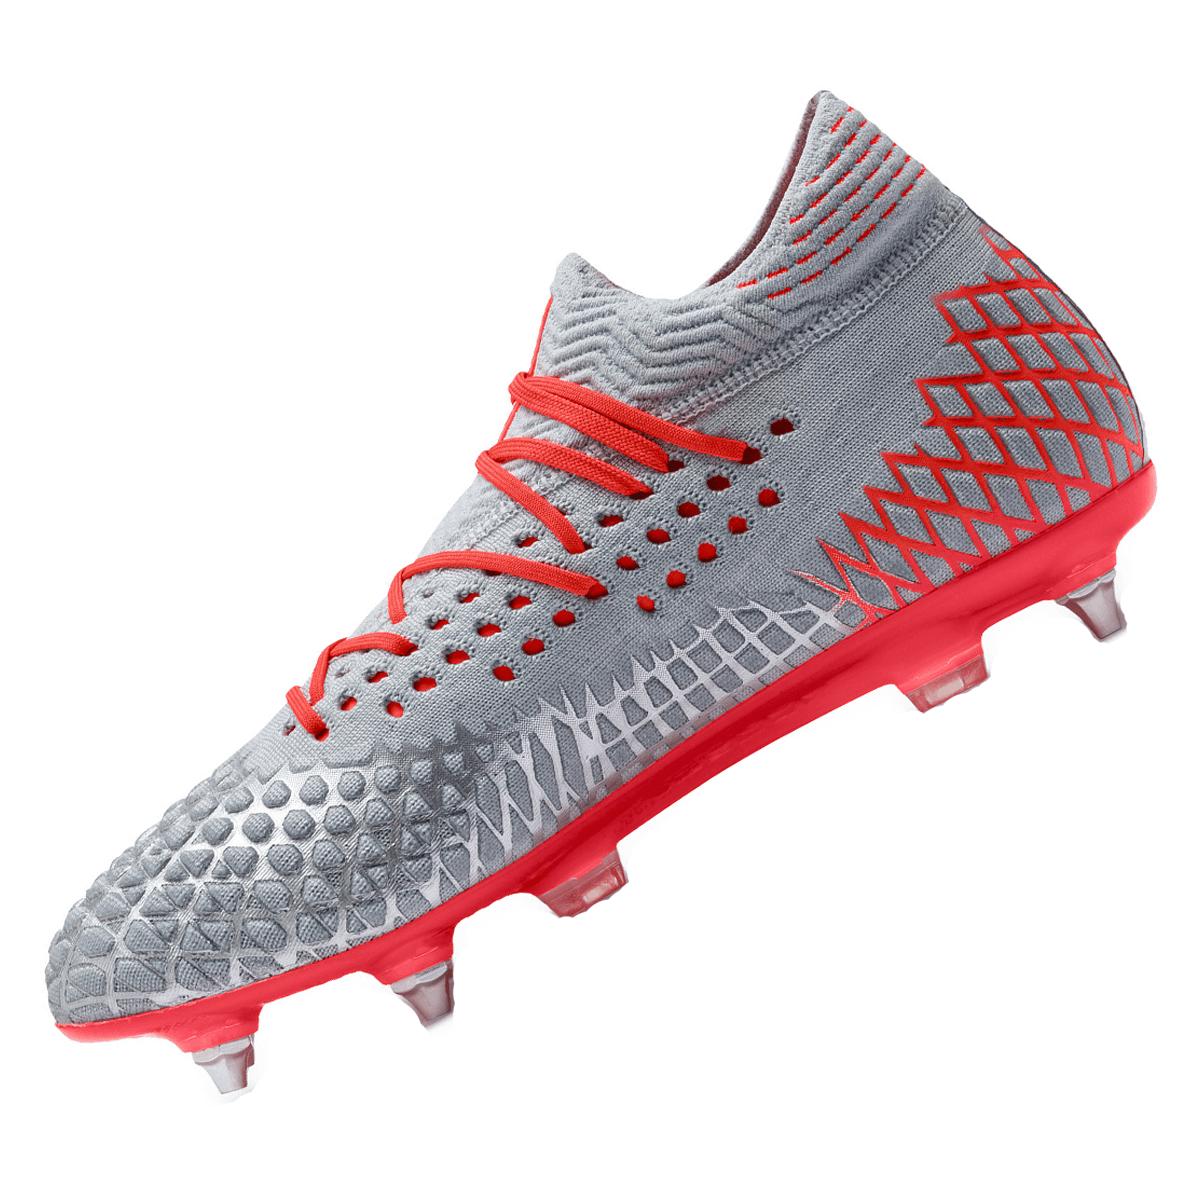 Puma Fußballschuh Future 4.1 Netfit Mx SG grauorange